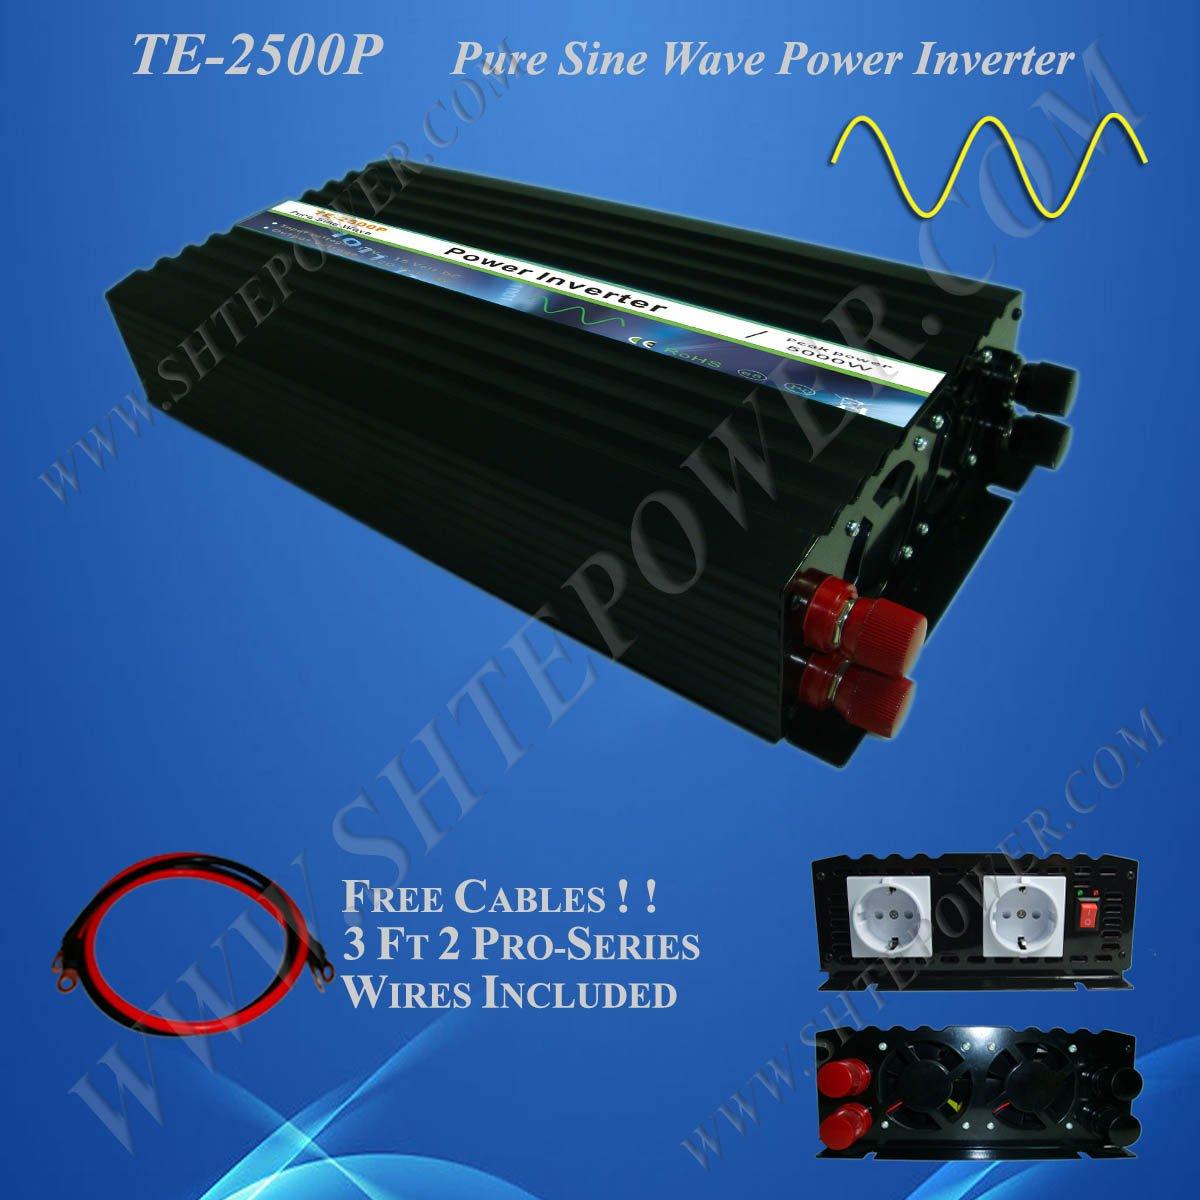 2500w solar inverter, off grid inverter, DC 24v to AC 220/230/240v, pure sine wave power inverter, hot items